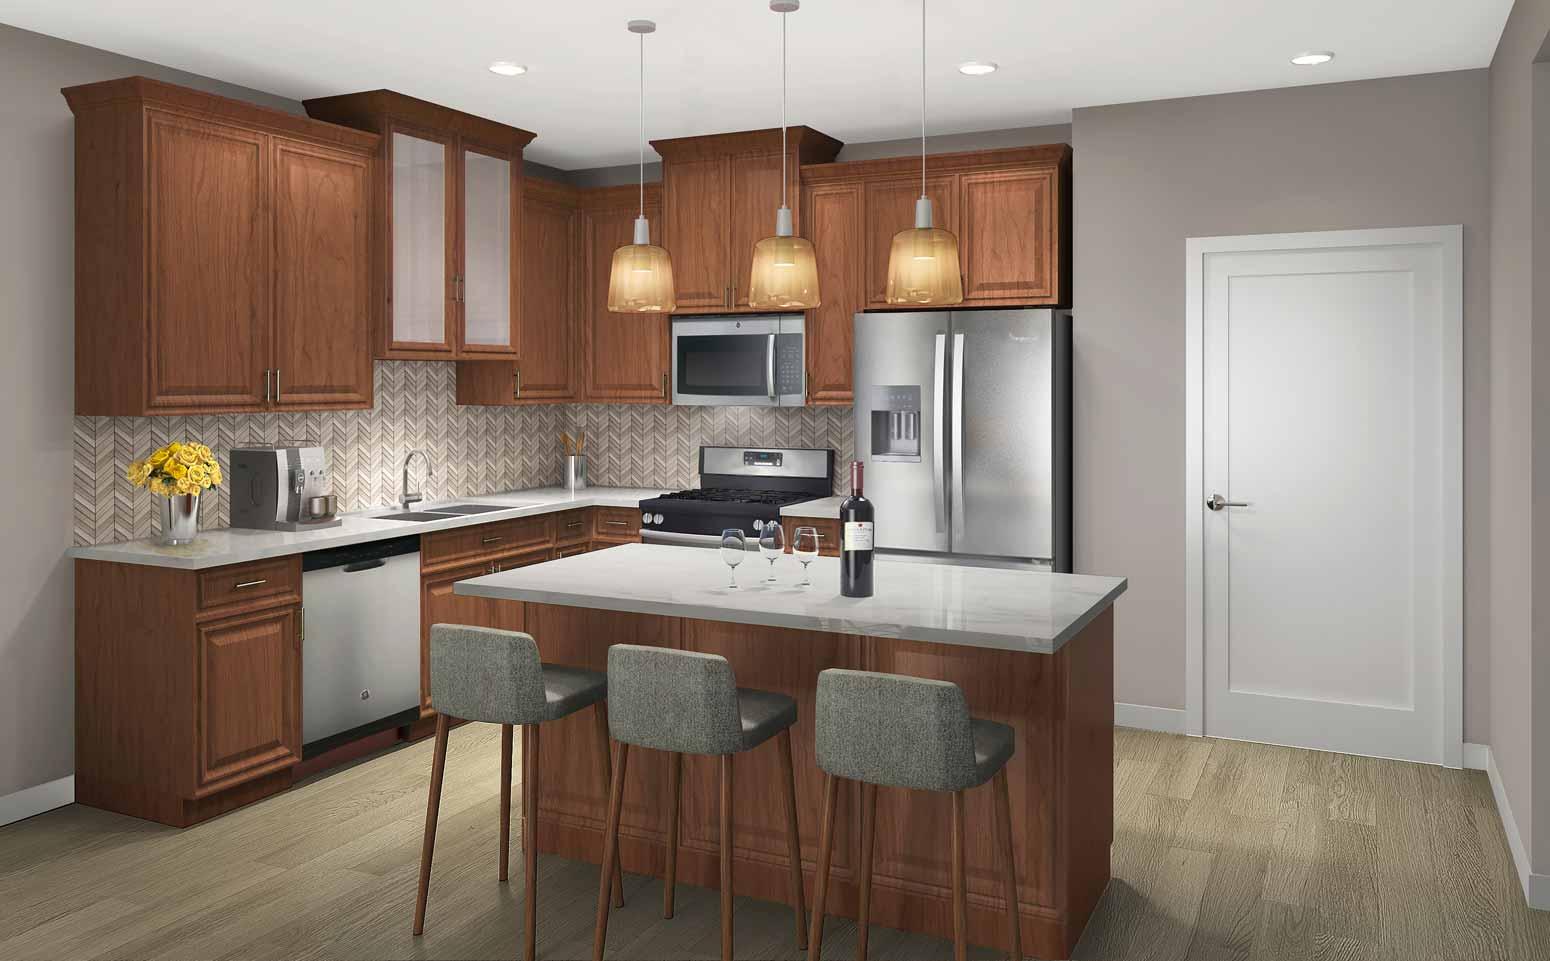 Summit design scheme with rich, cider wood cabinetry, herringbone backsplash and light quartz countertops